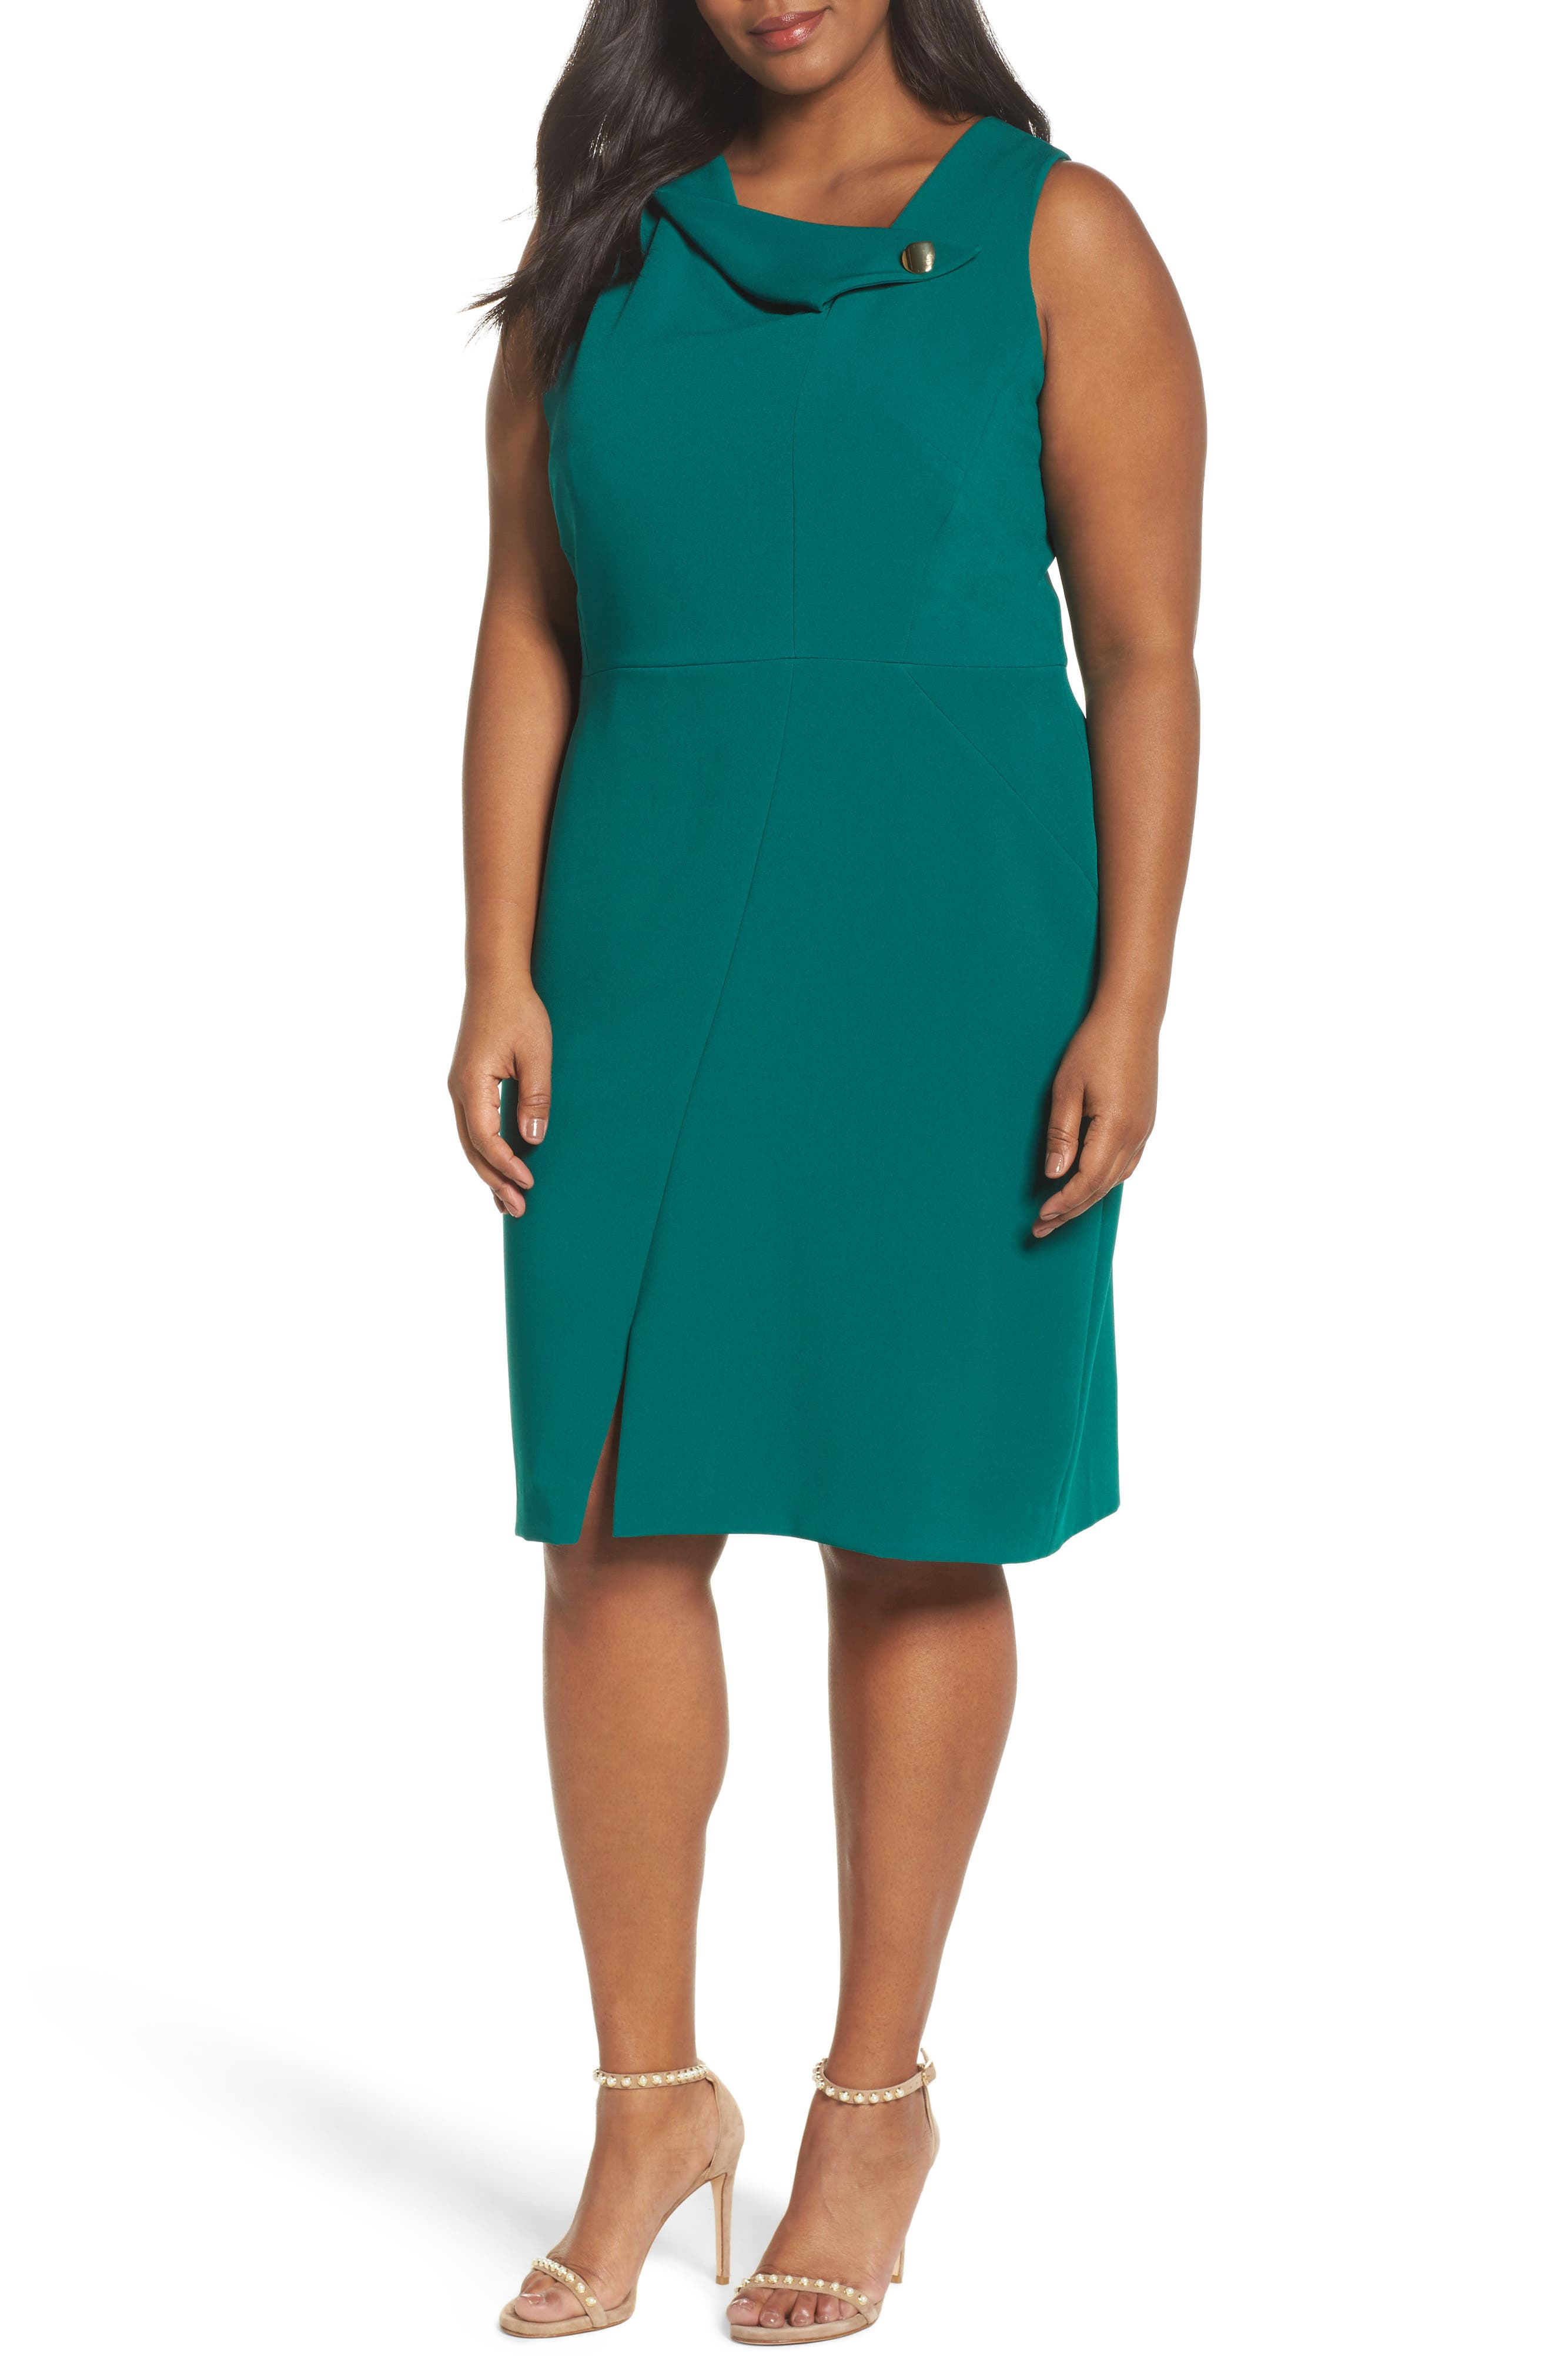 Main Image - Tahari Envelope Neck with Button Sheath Dress (Plus Size)